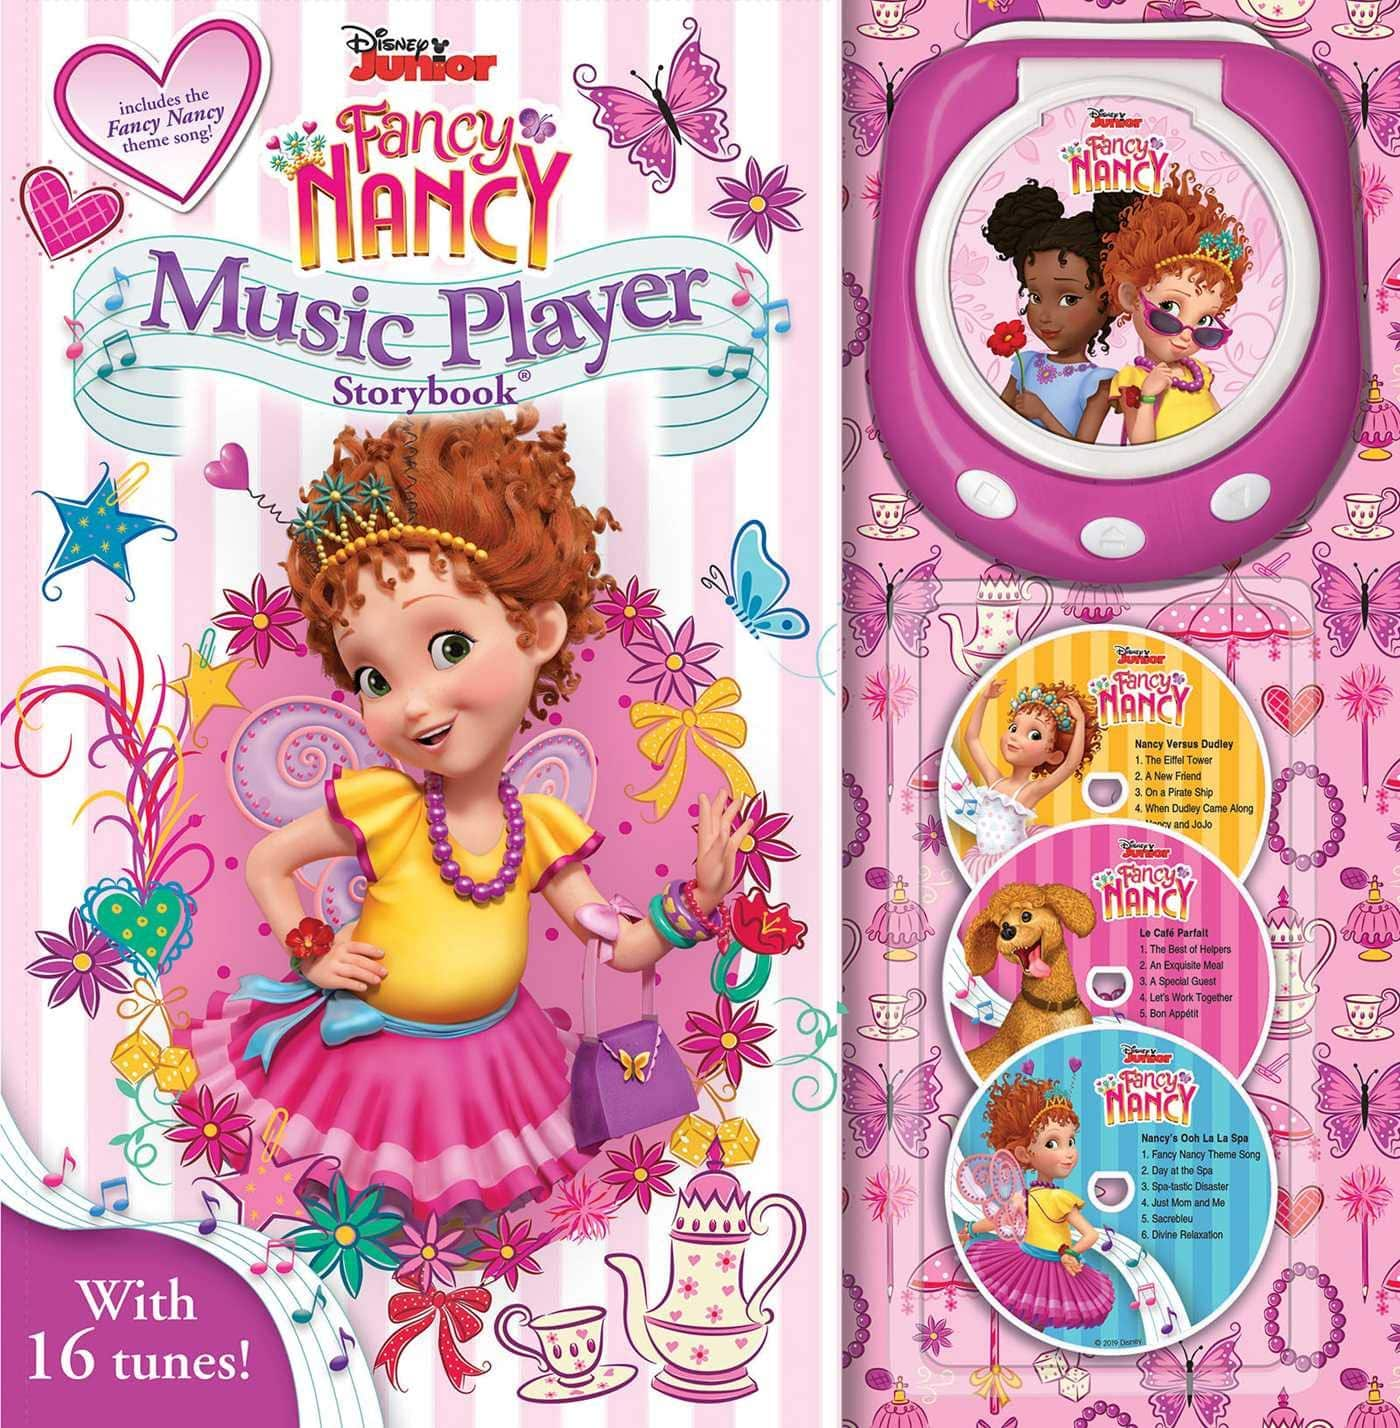 Disney Fancy Nancy Music Player Storybook $8.06 - Amazon / Walmart